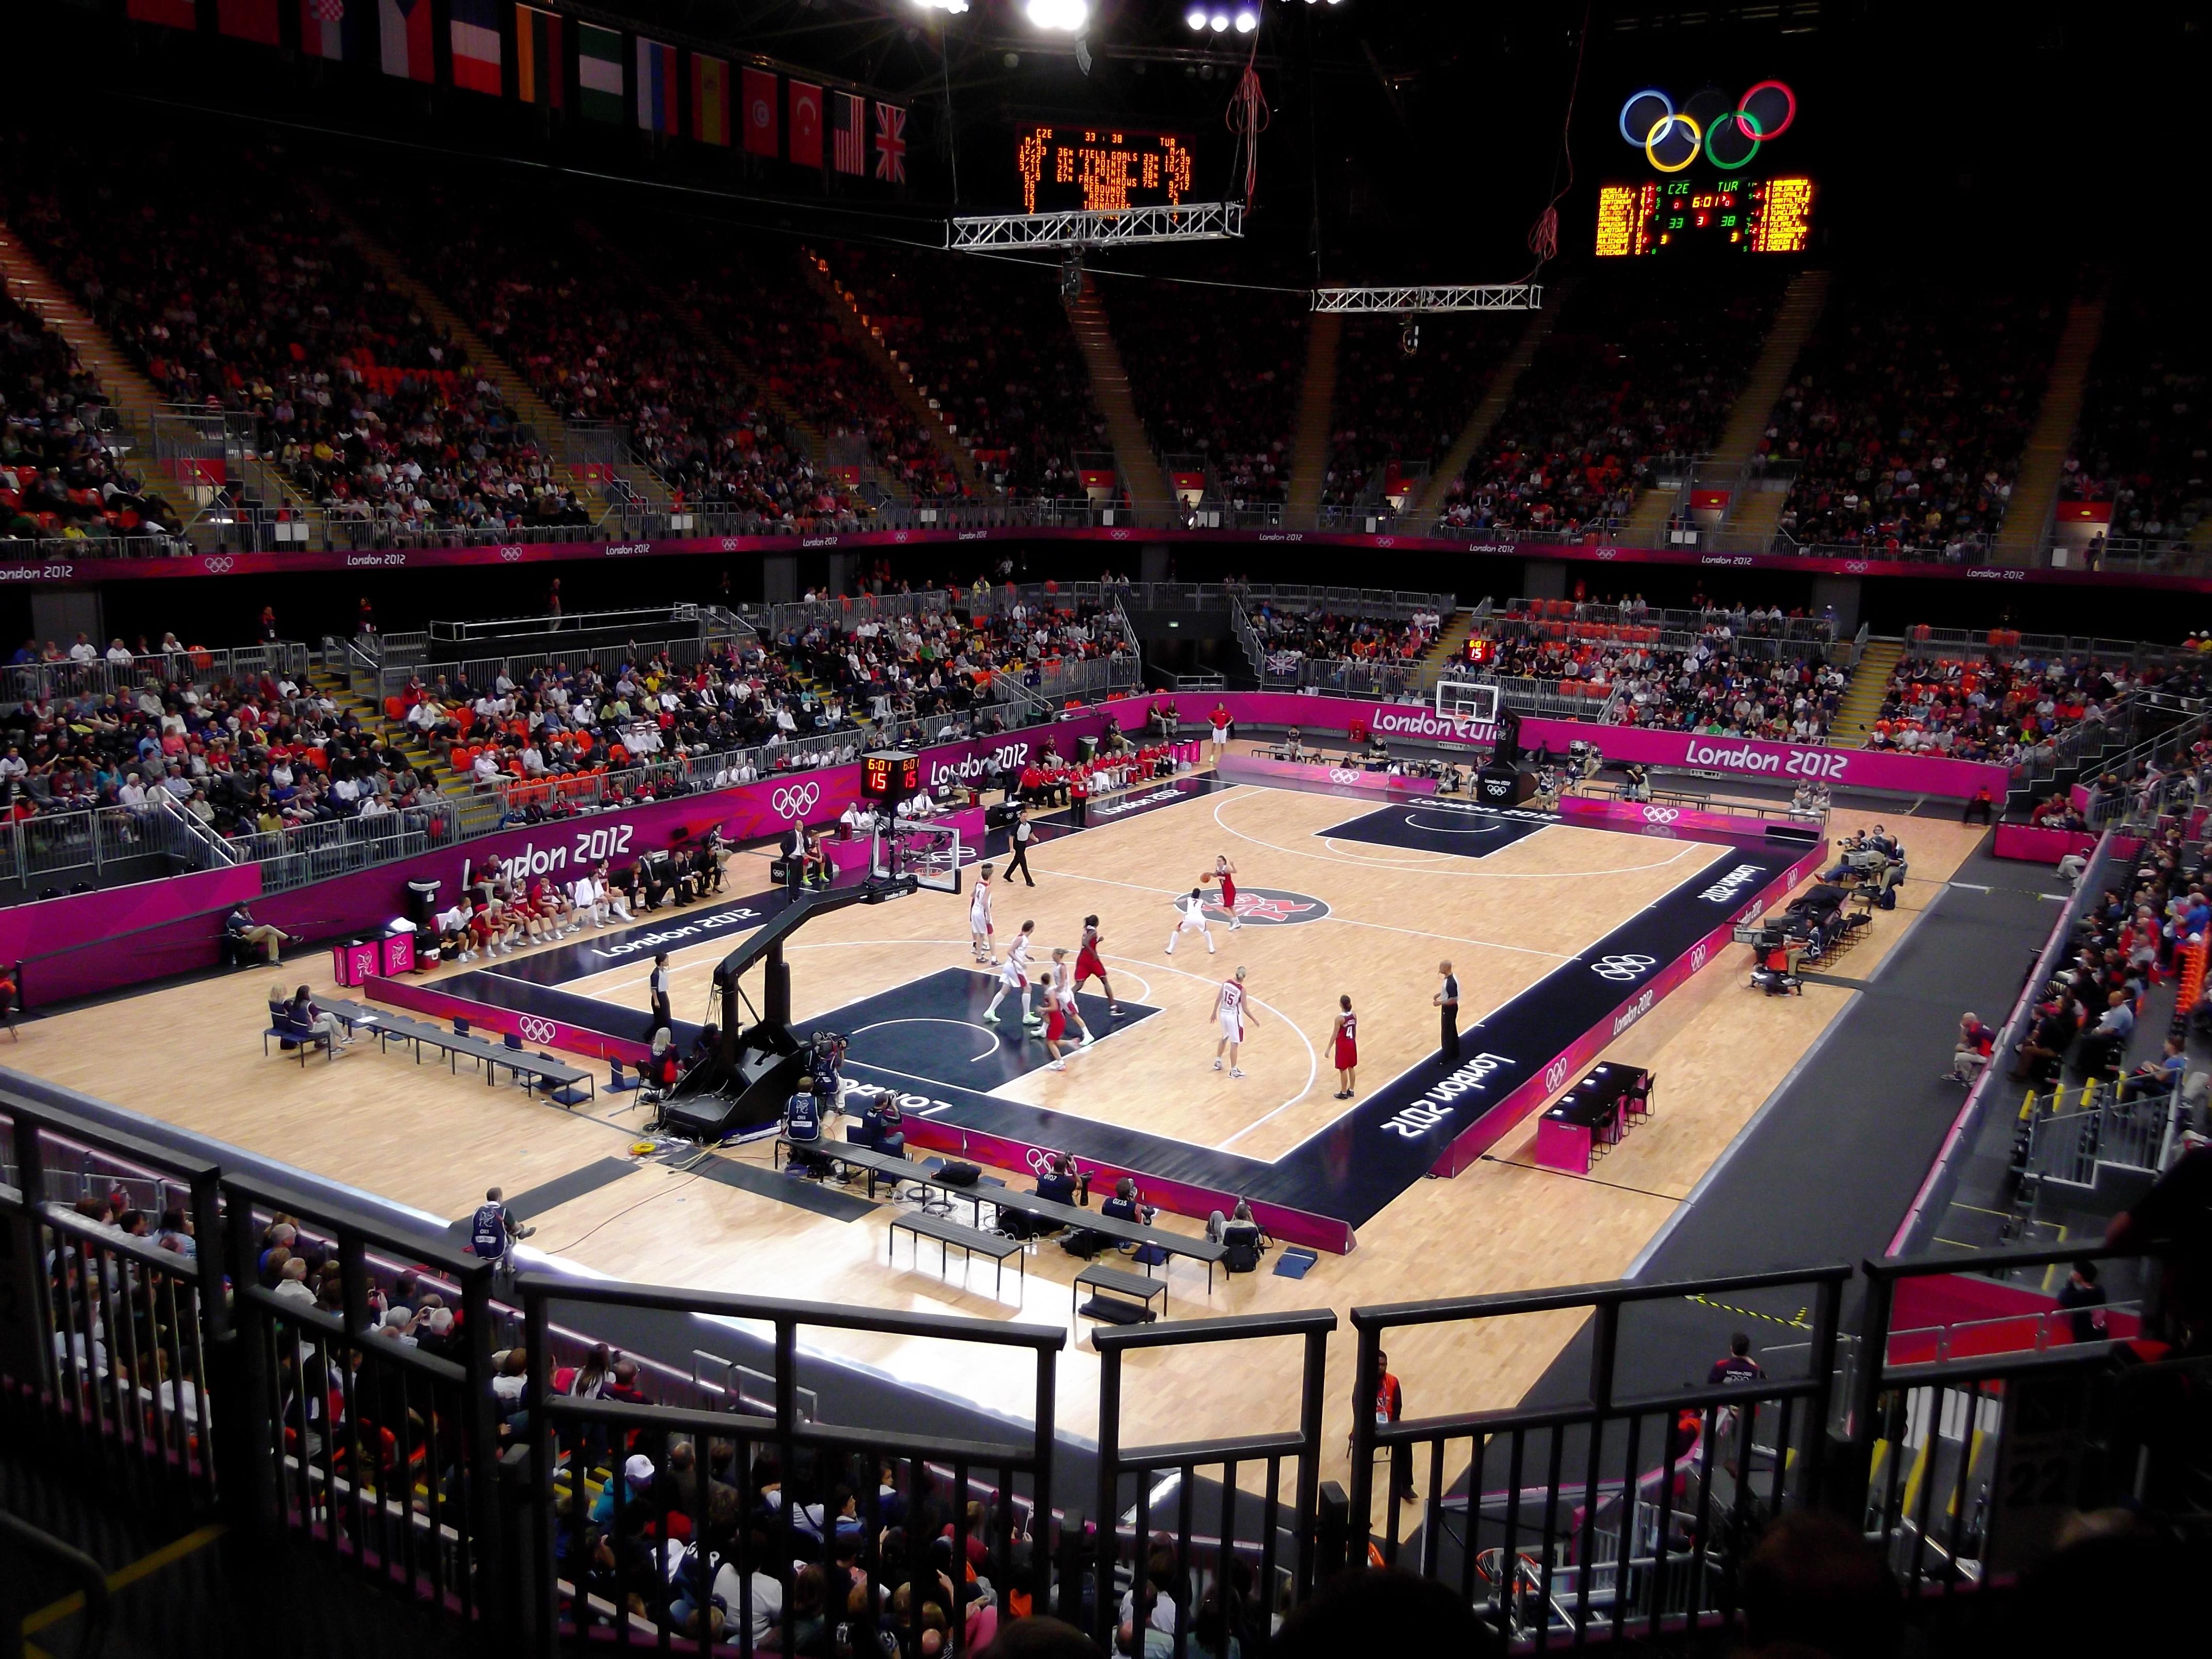 File:London 2012 Olympics 058 Basketball Arena (96) - Czech Republic v Turkey.jpg - Wikimedia ...